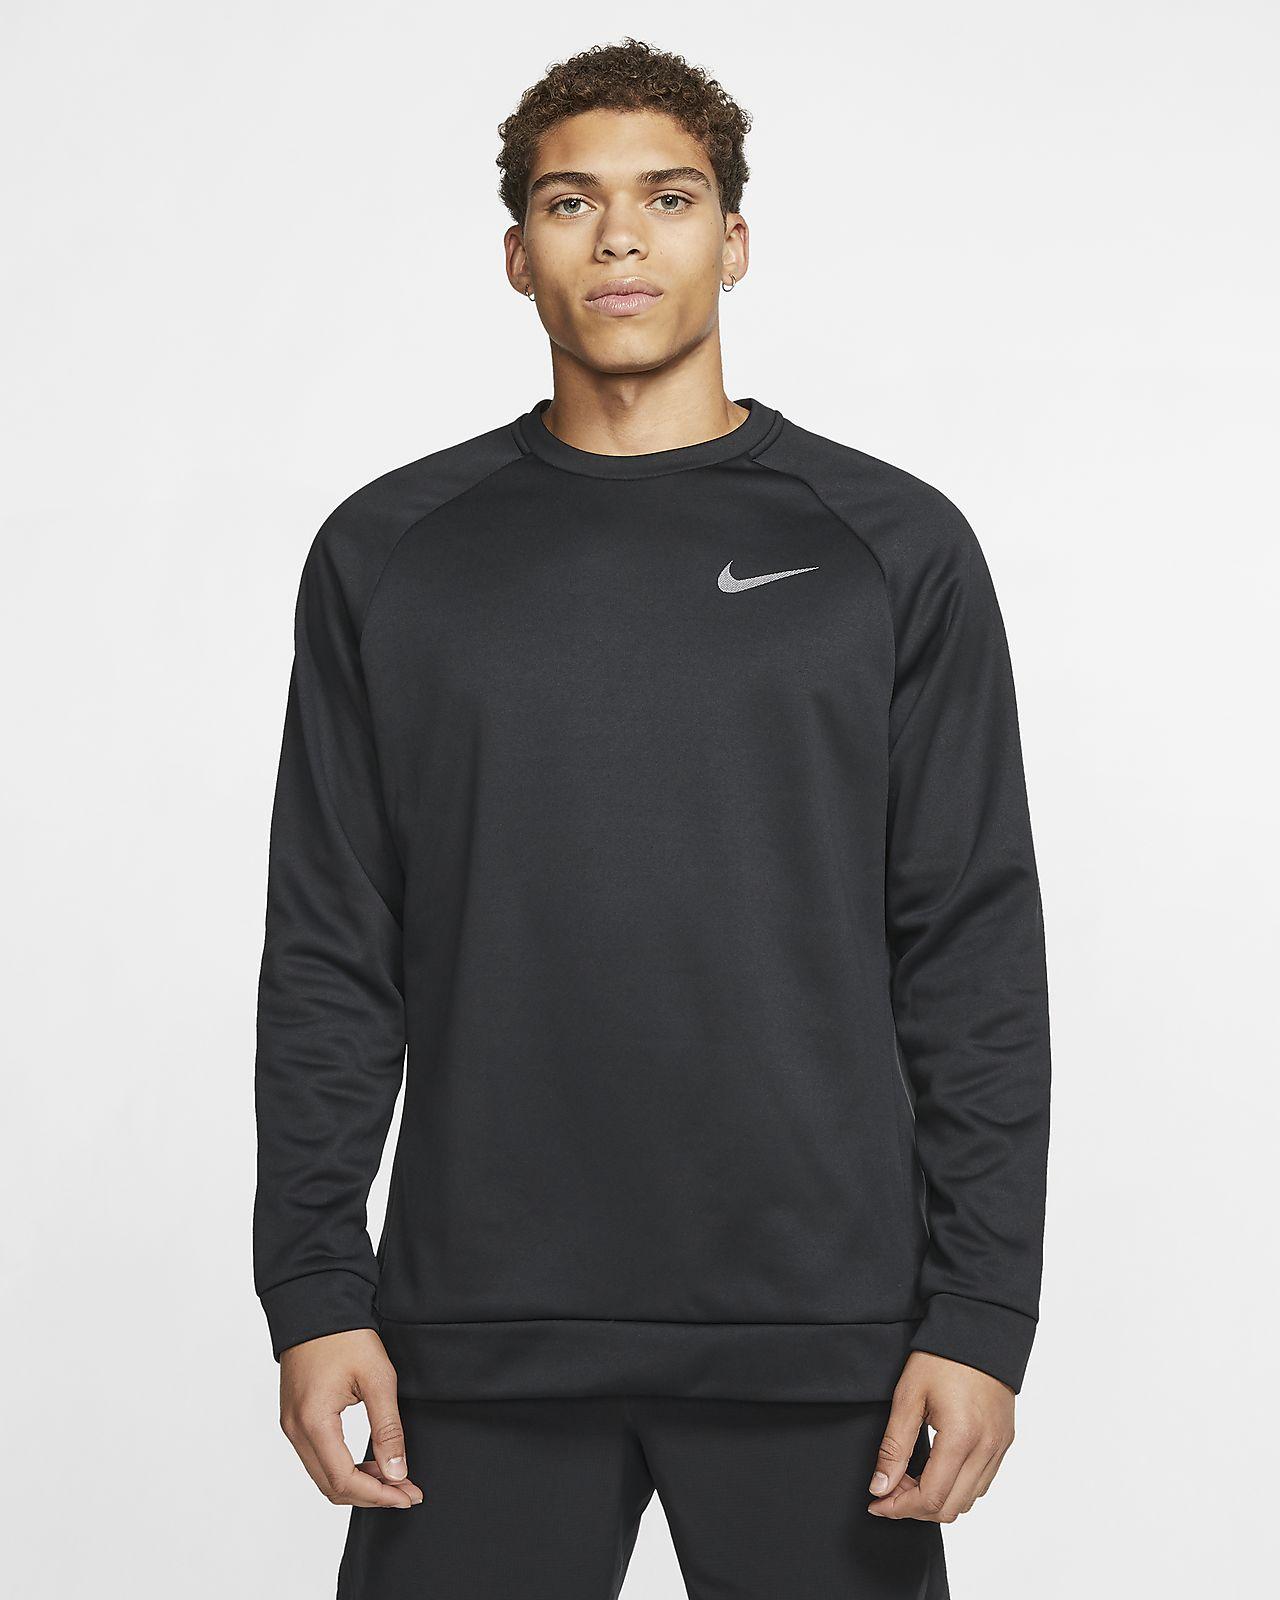 Nike Therma Herren-Trainingsoberteil